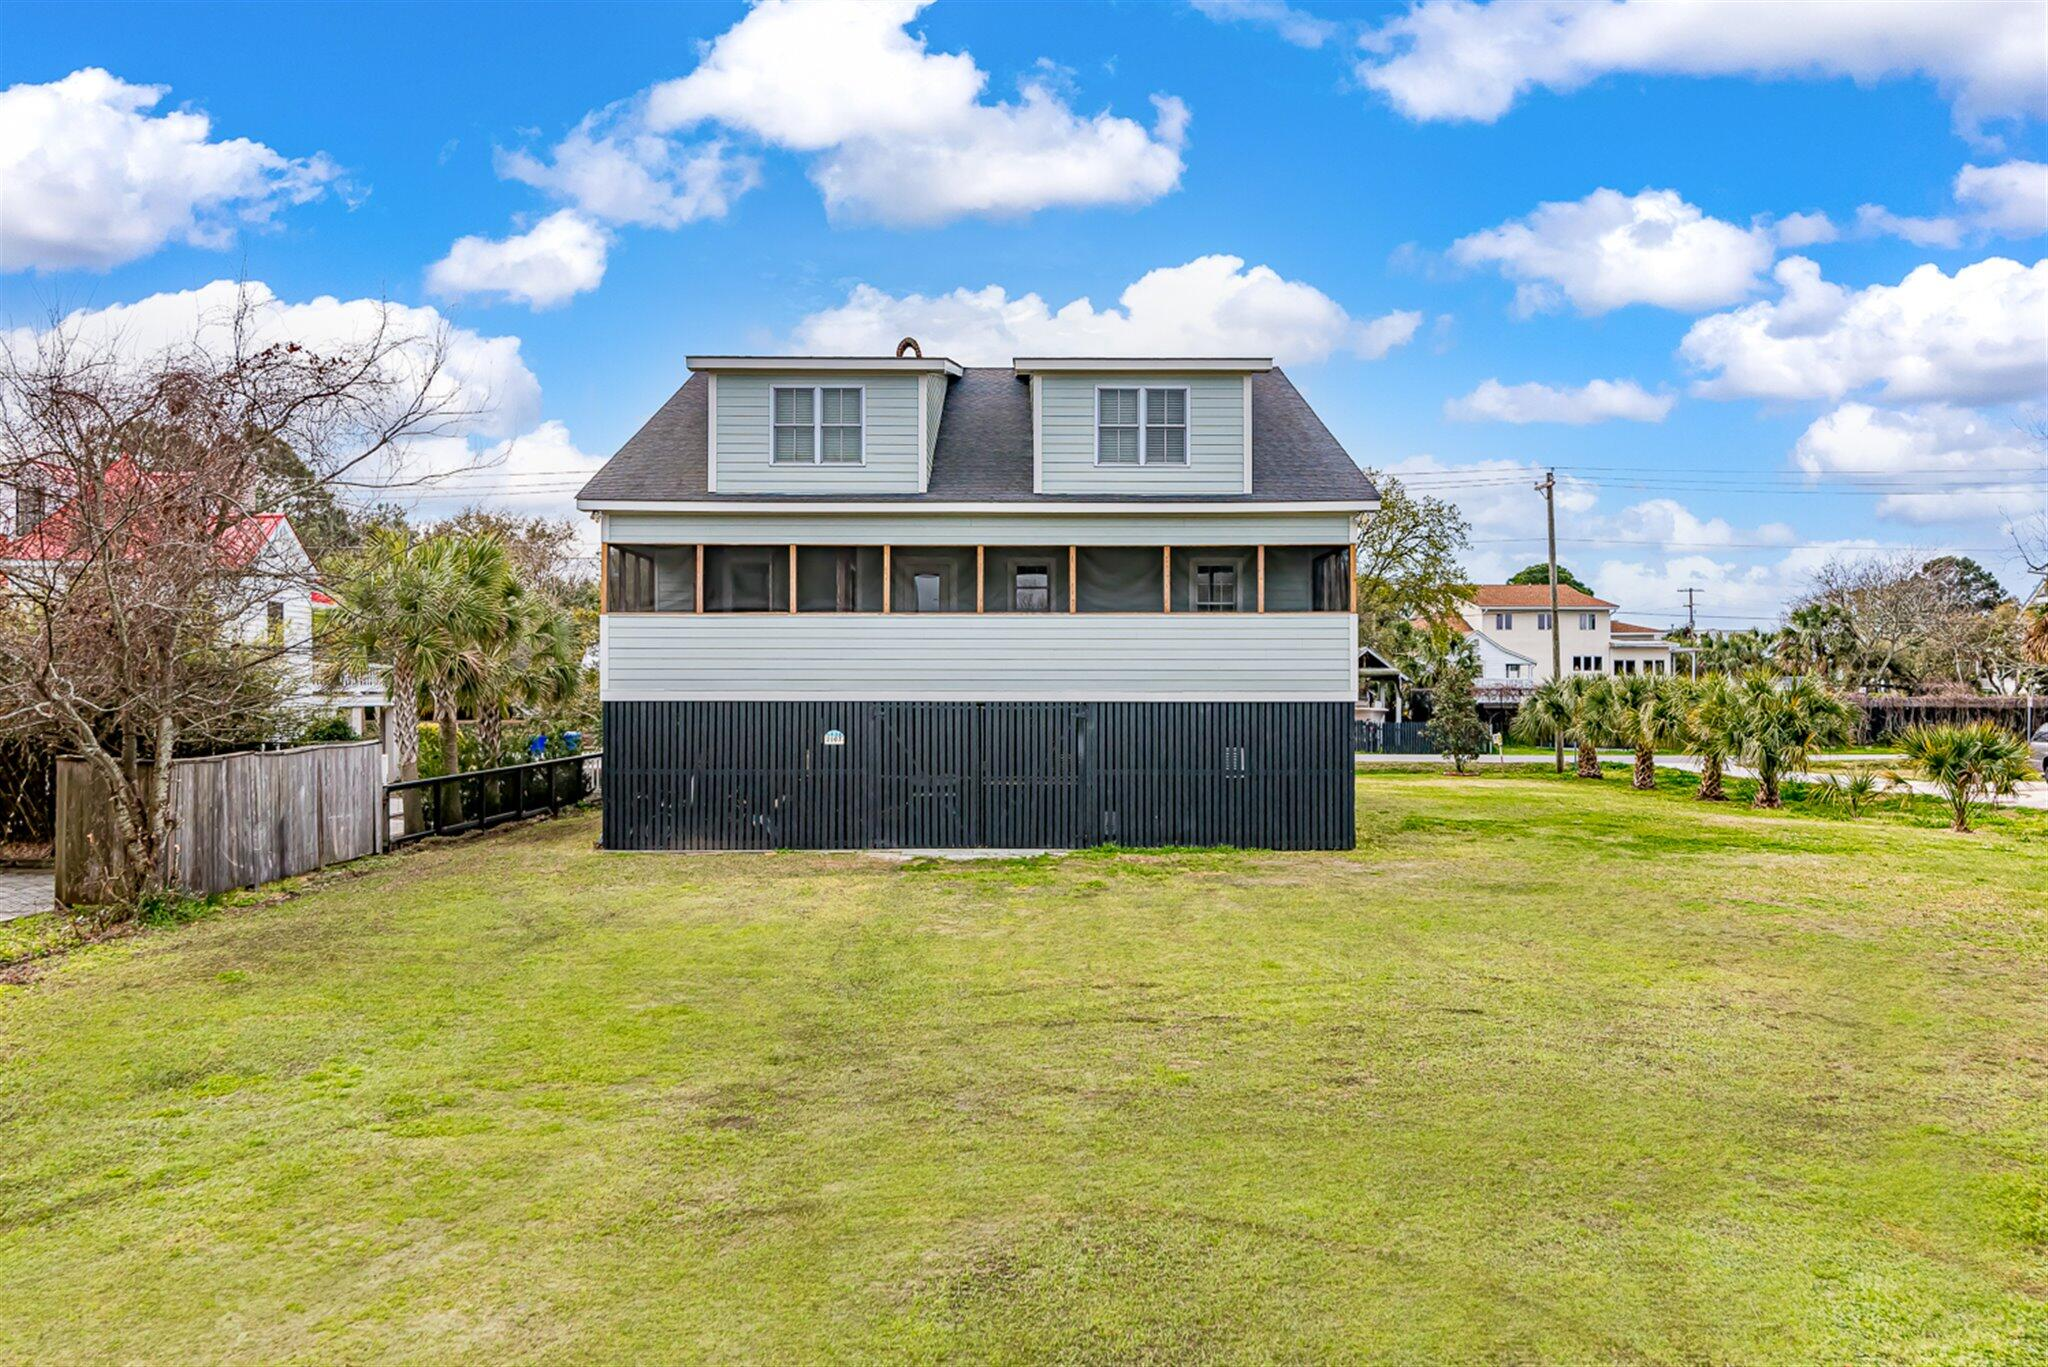 Sullivans Island Homes For Sale - 2107 Middle, Sullivans Island, SC - 6